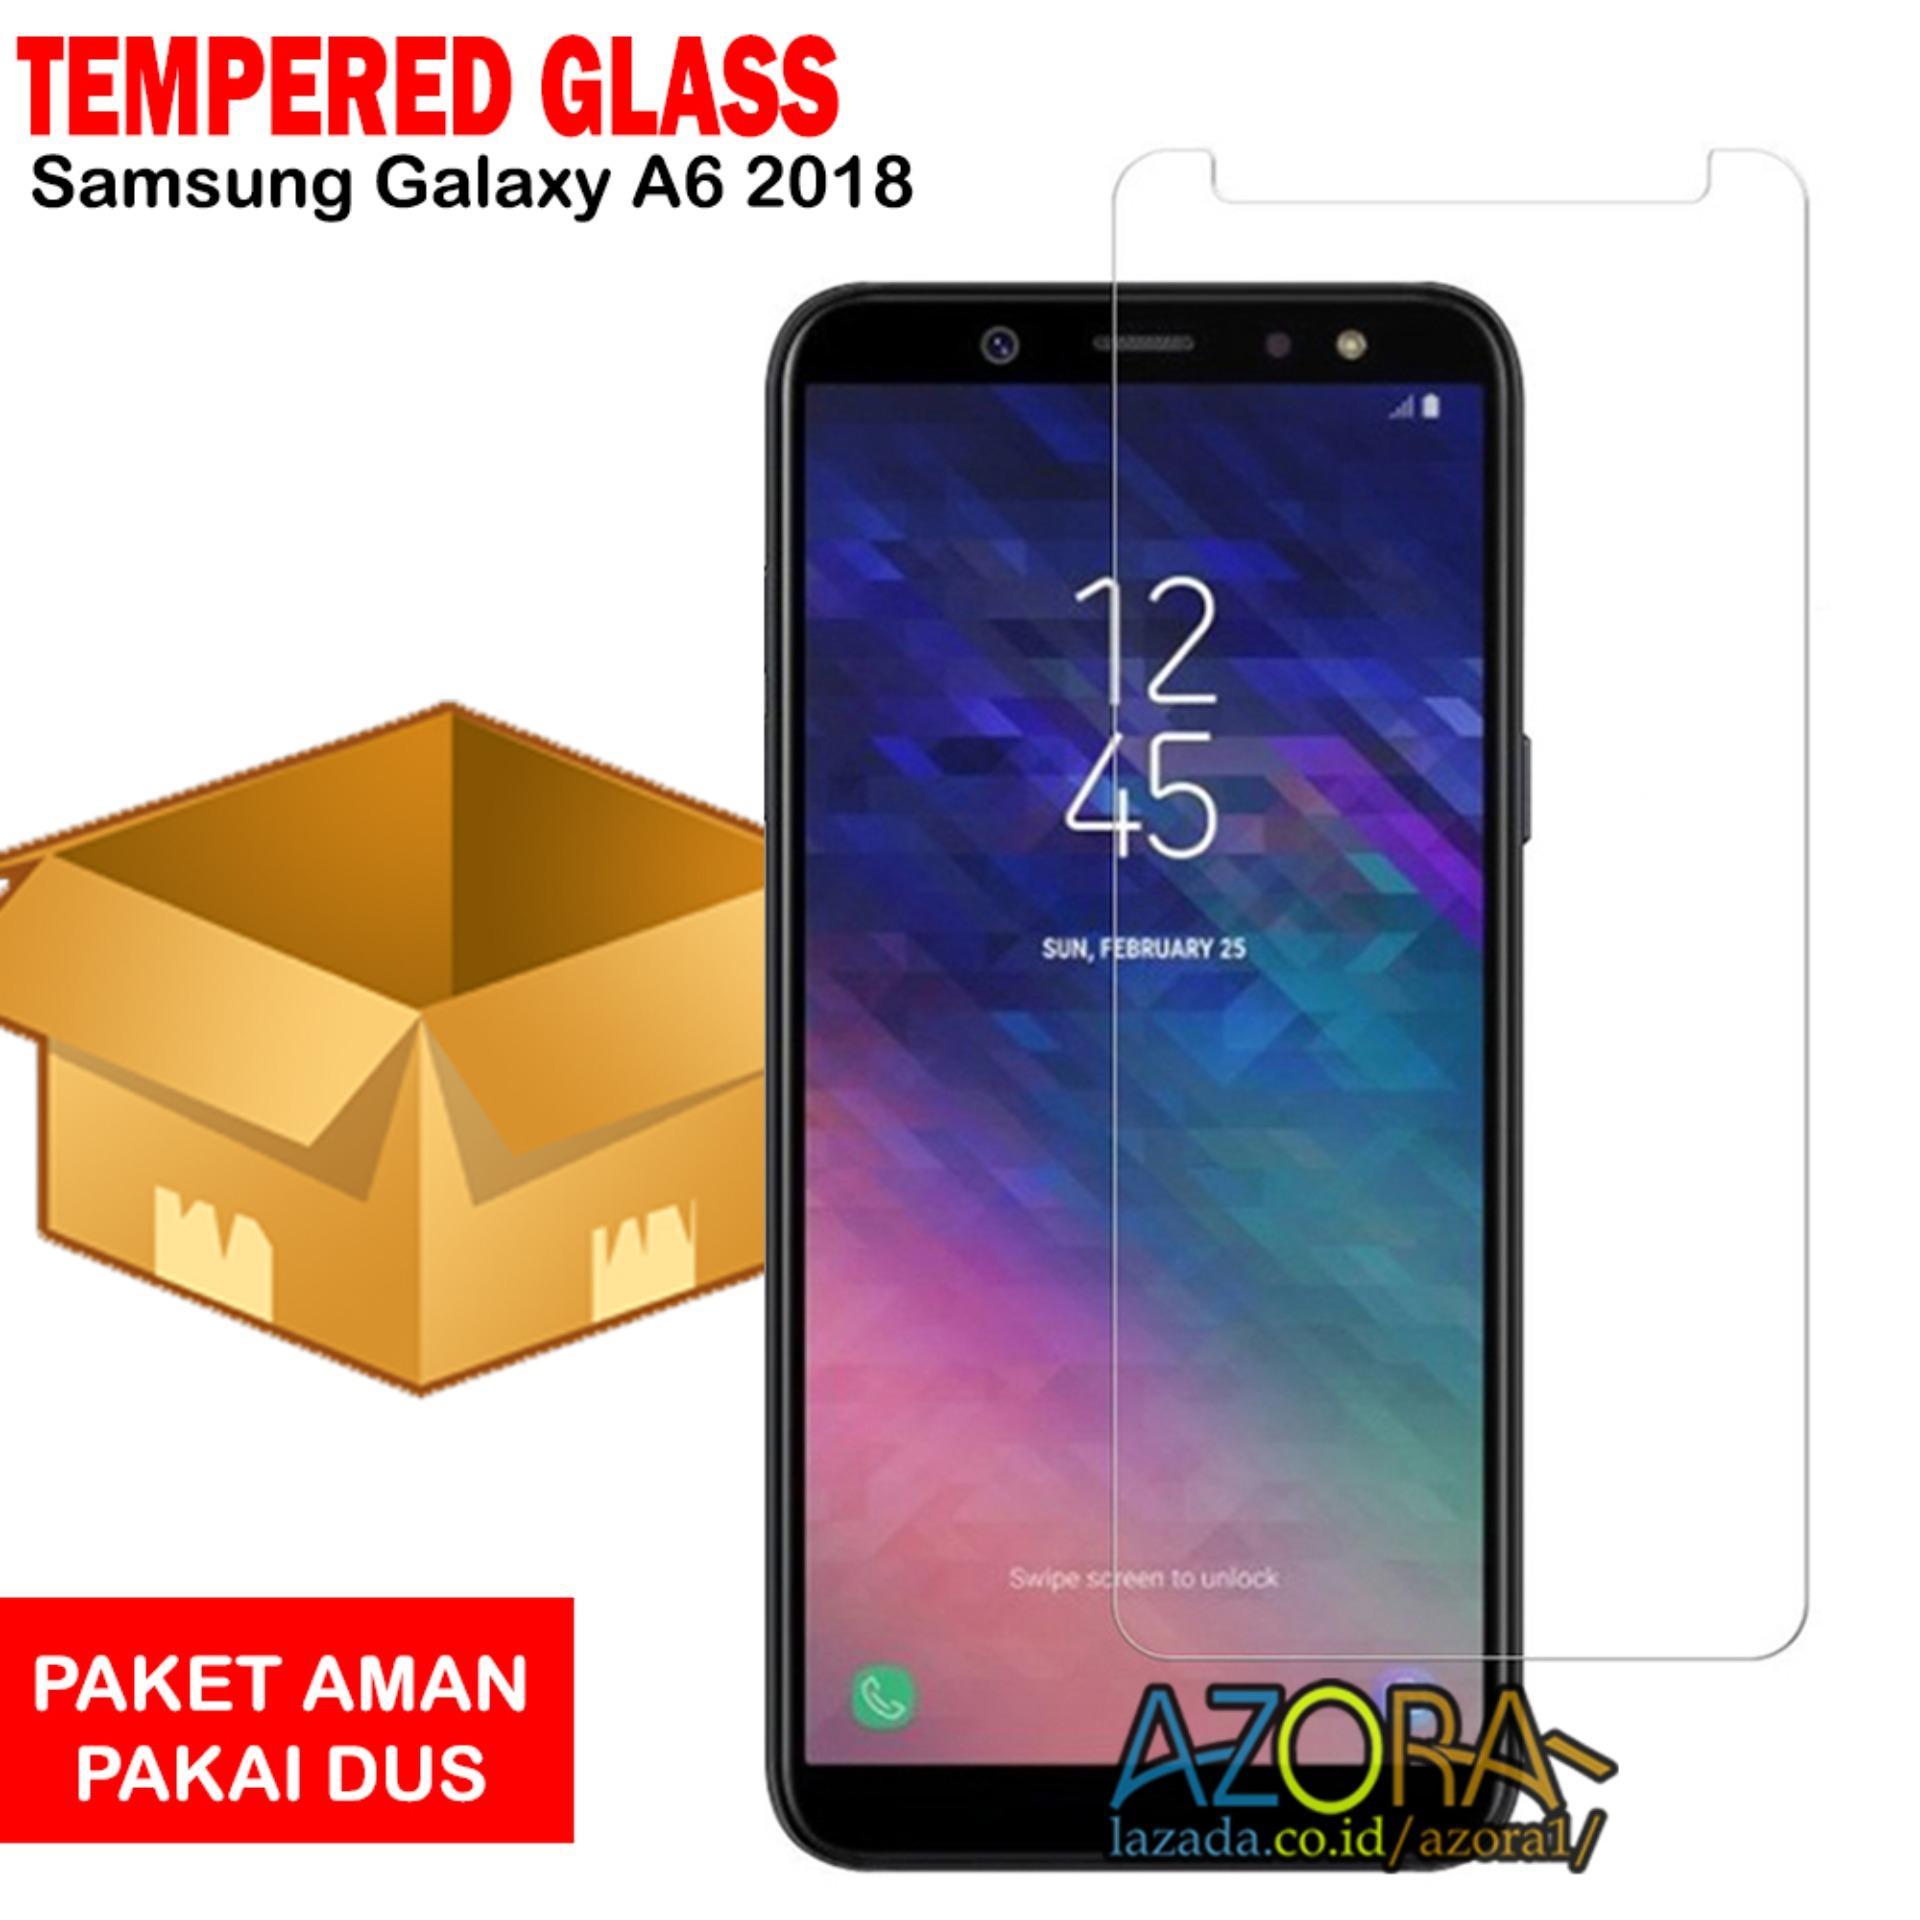 Tempered Glass Samsung Galaxy A6 2018 5,6